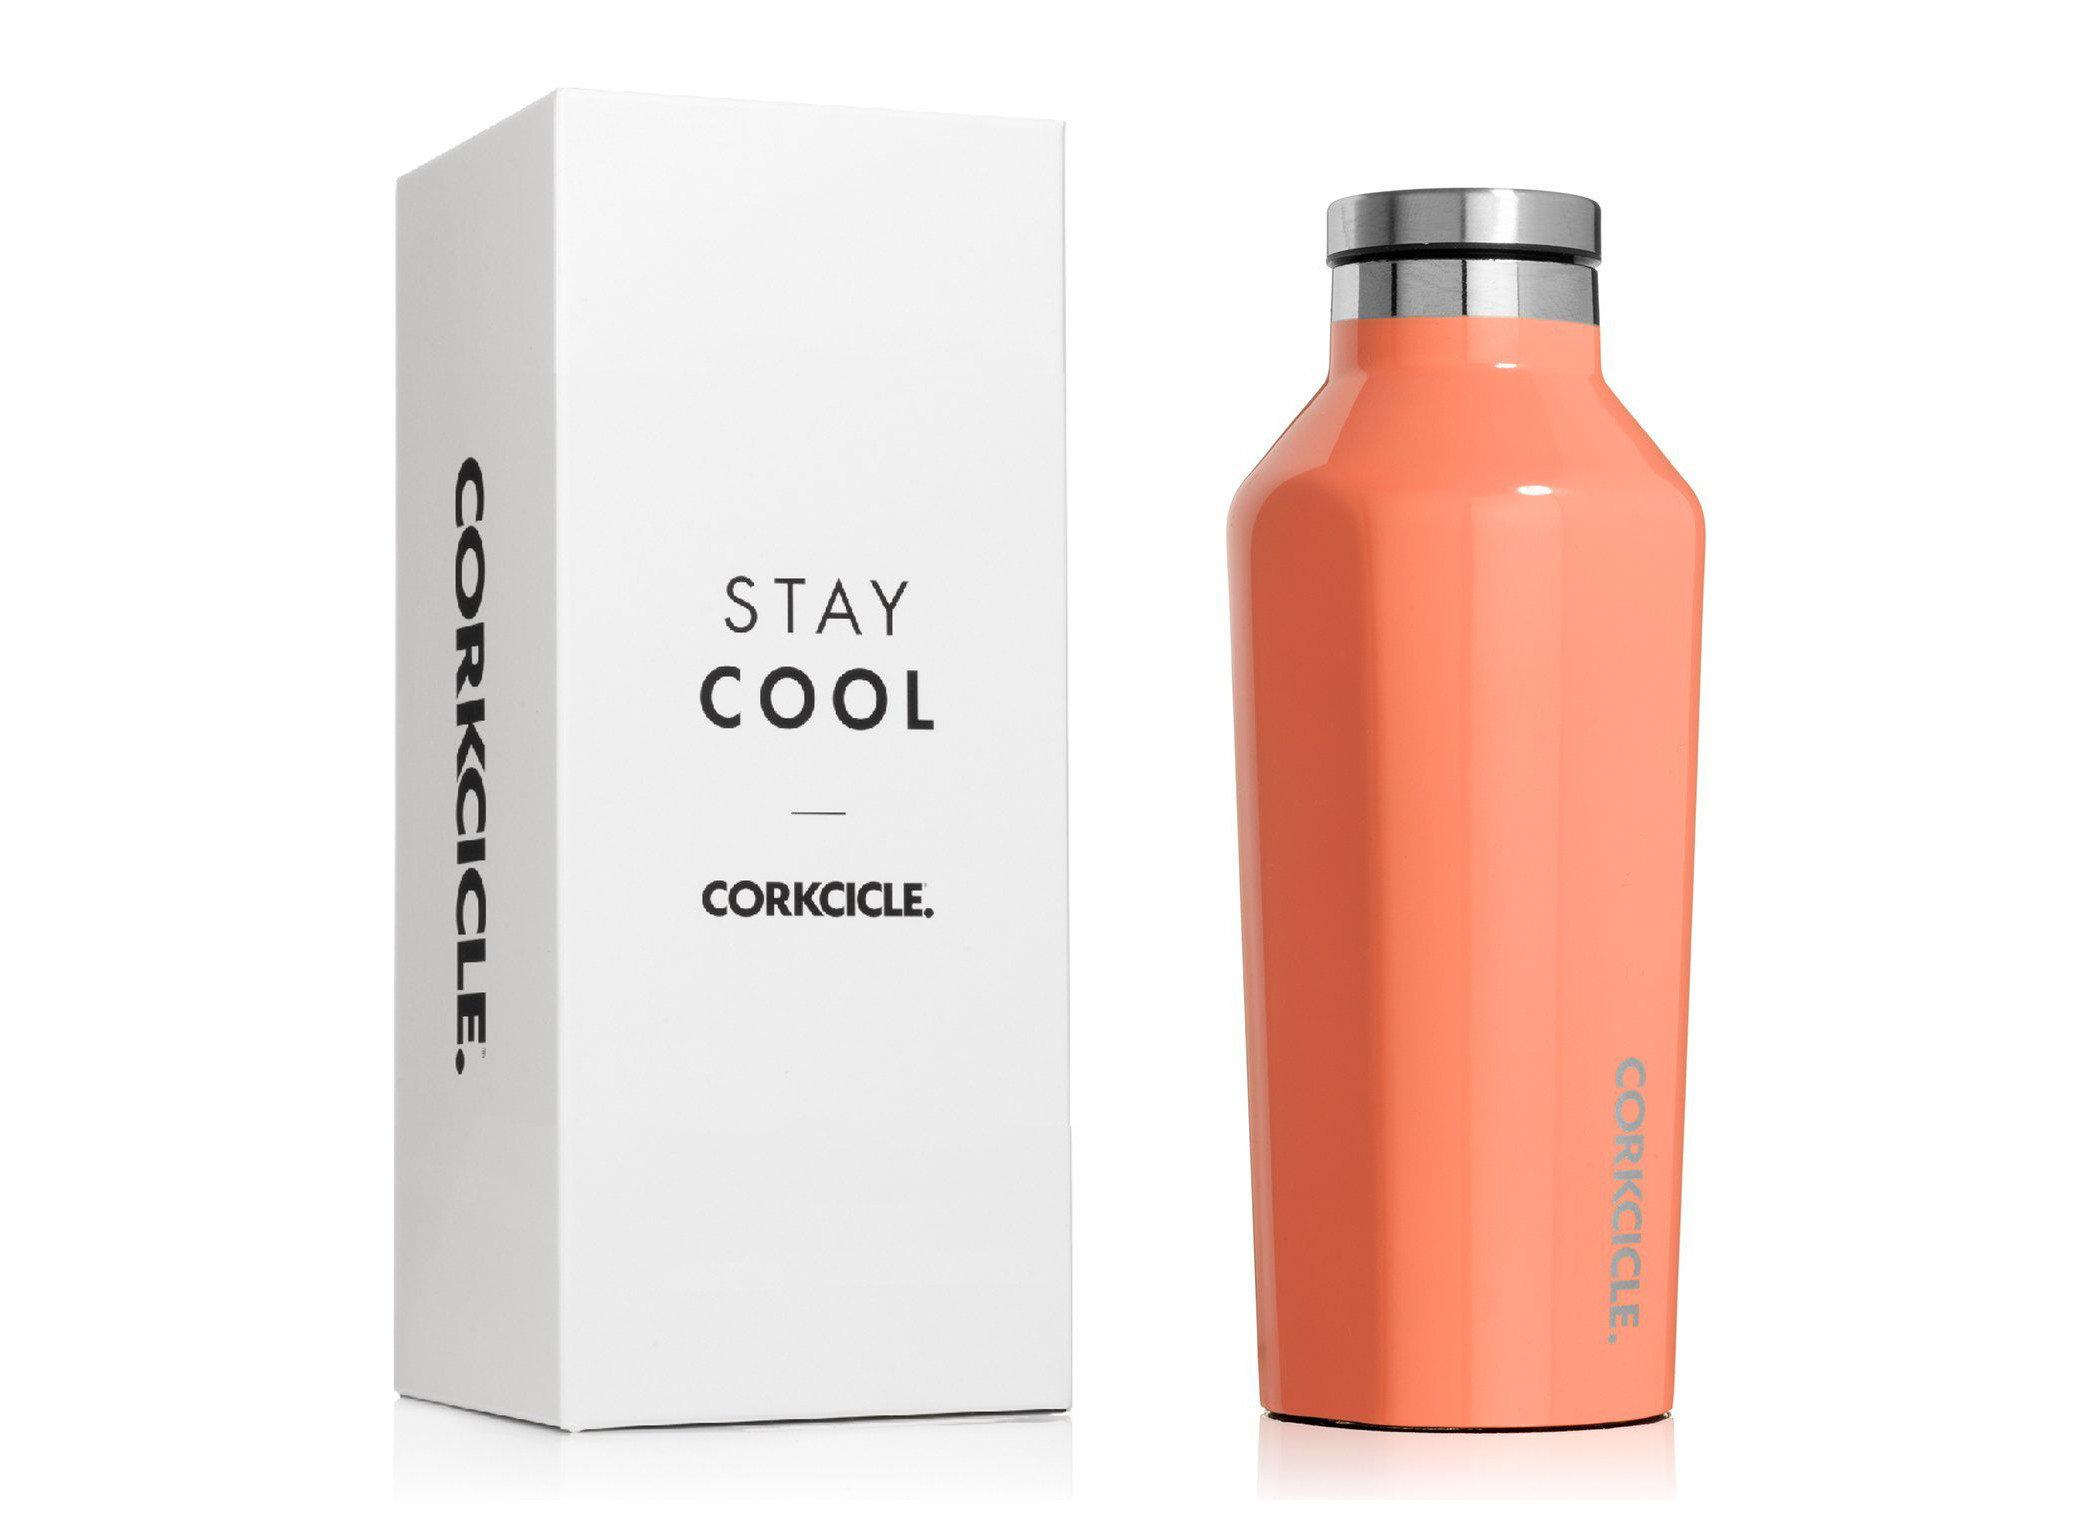 Style + Design bottle product product design perfume